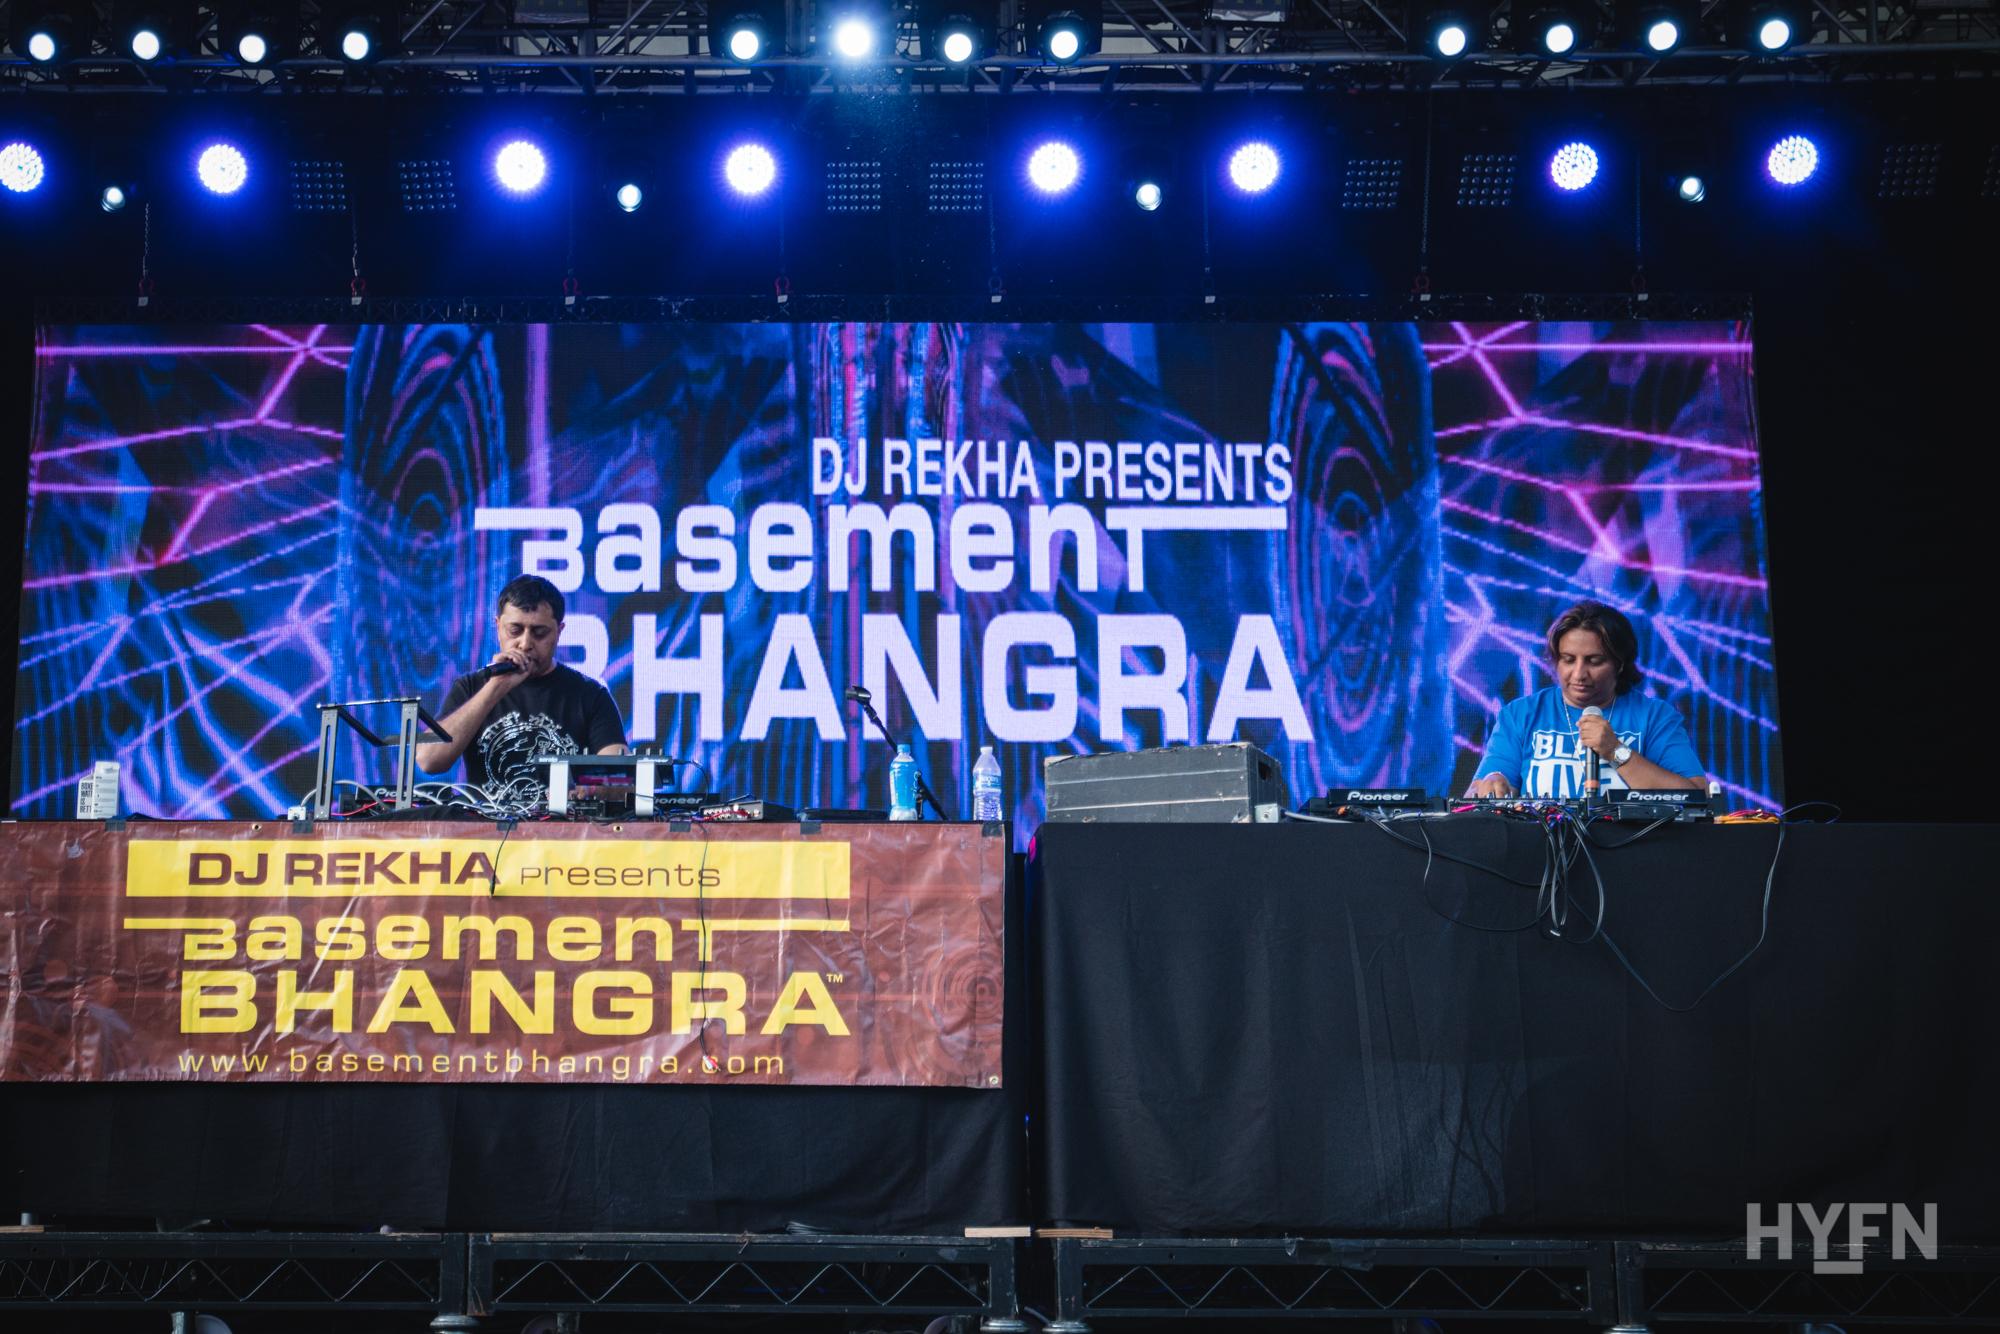 Summer Stage Basement Bhangra by HYFN-38.jpg